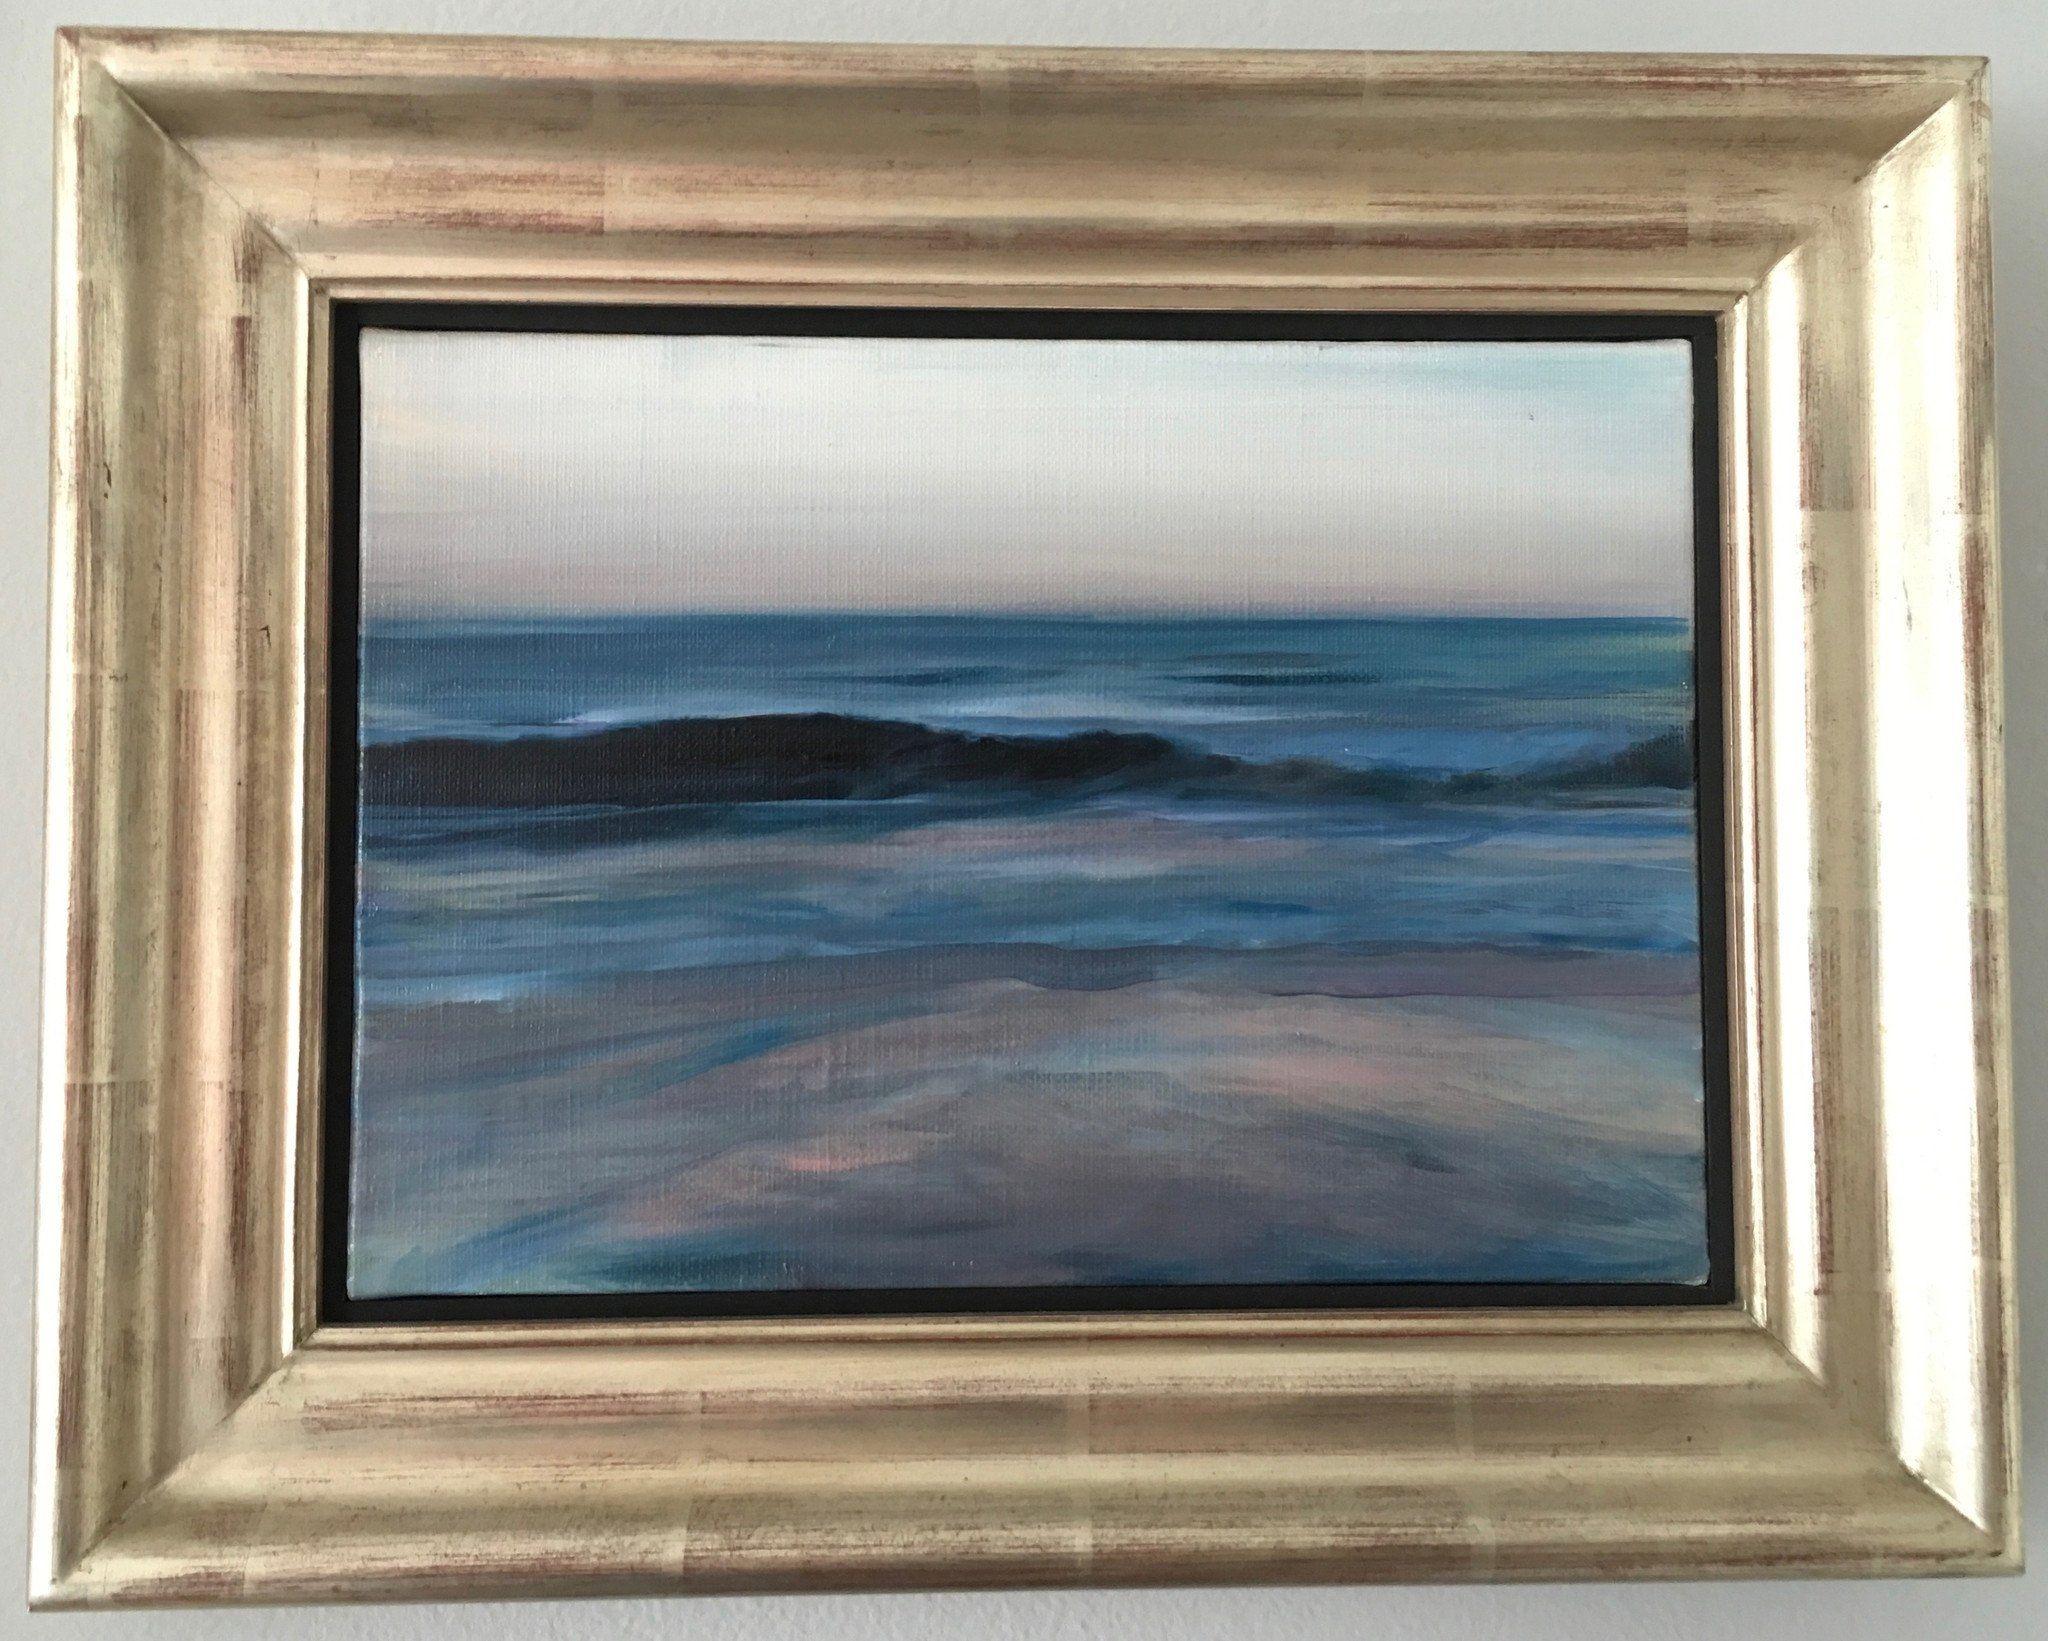 Paul P Canadian Artist Important Oil Painting Seascape